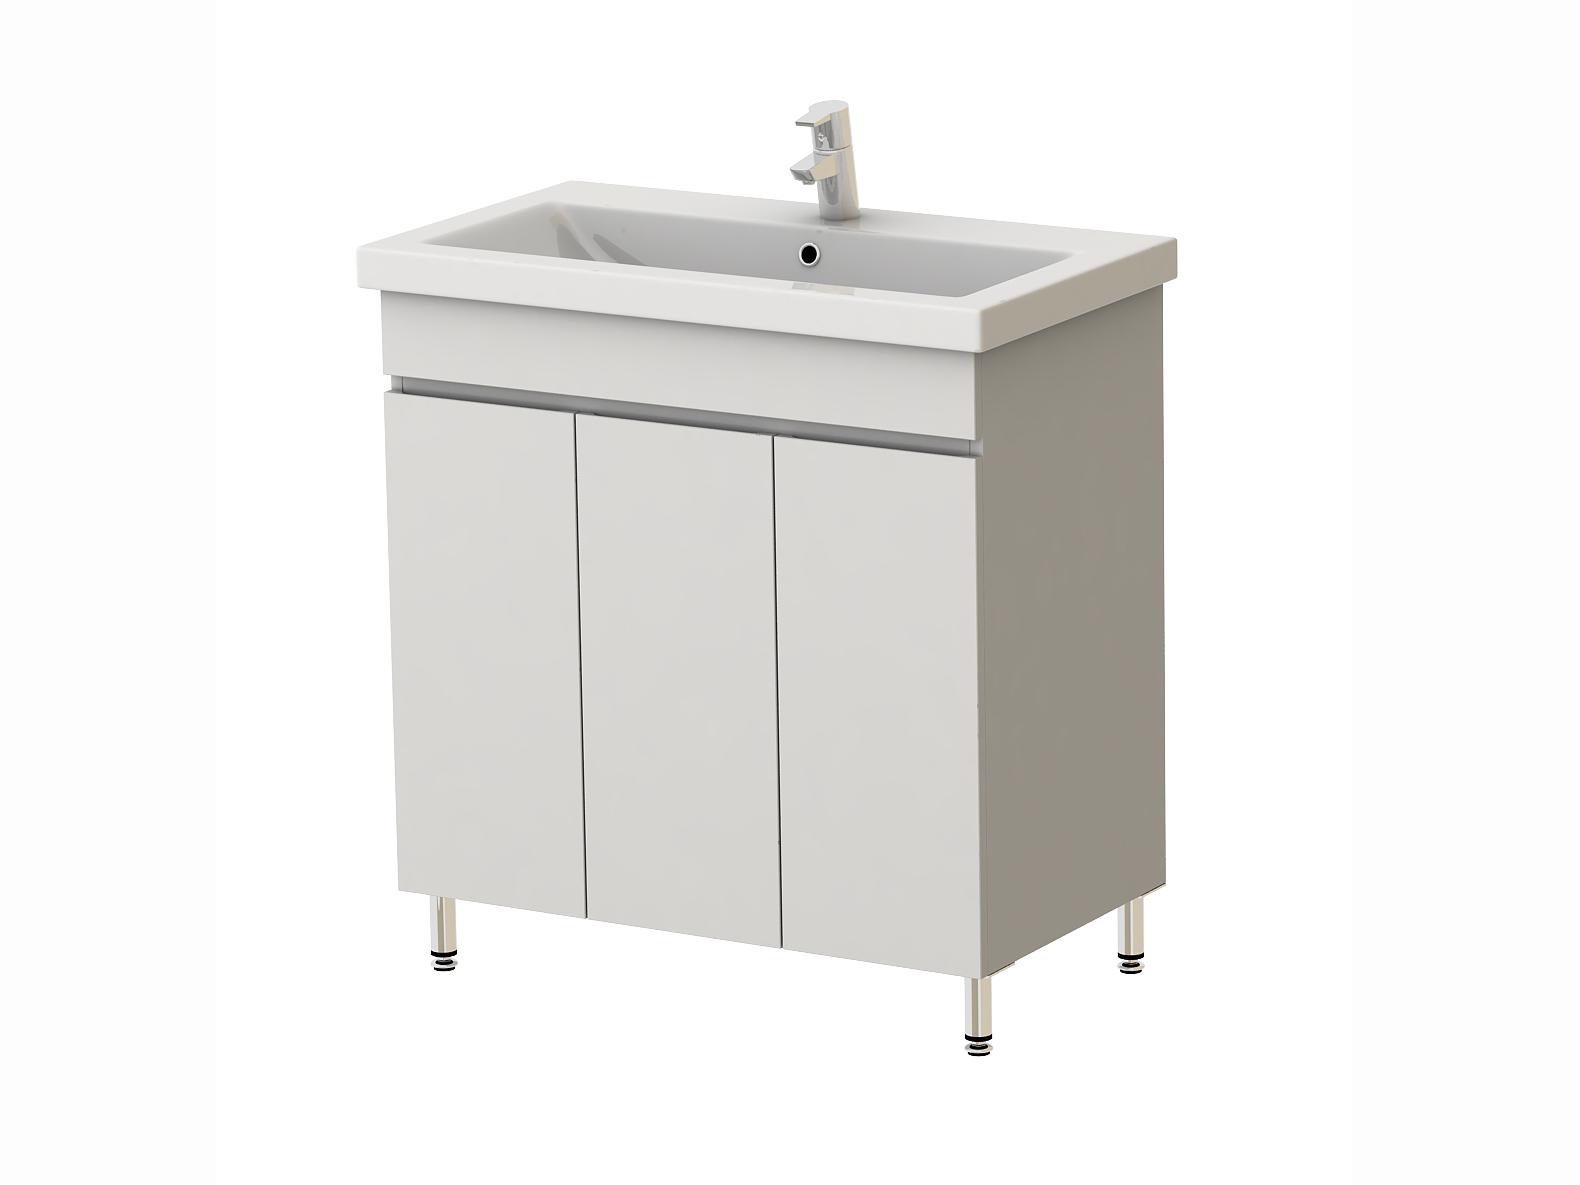 Koupelnová skříňka s umyvadlem - Juventa - Ariadna - AR3-80 W